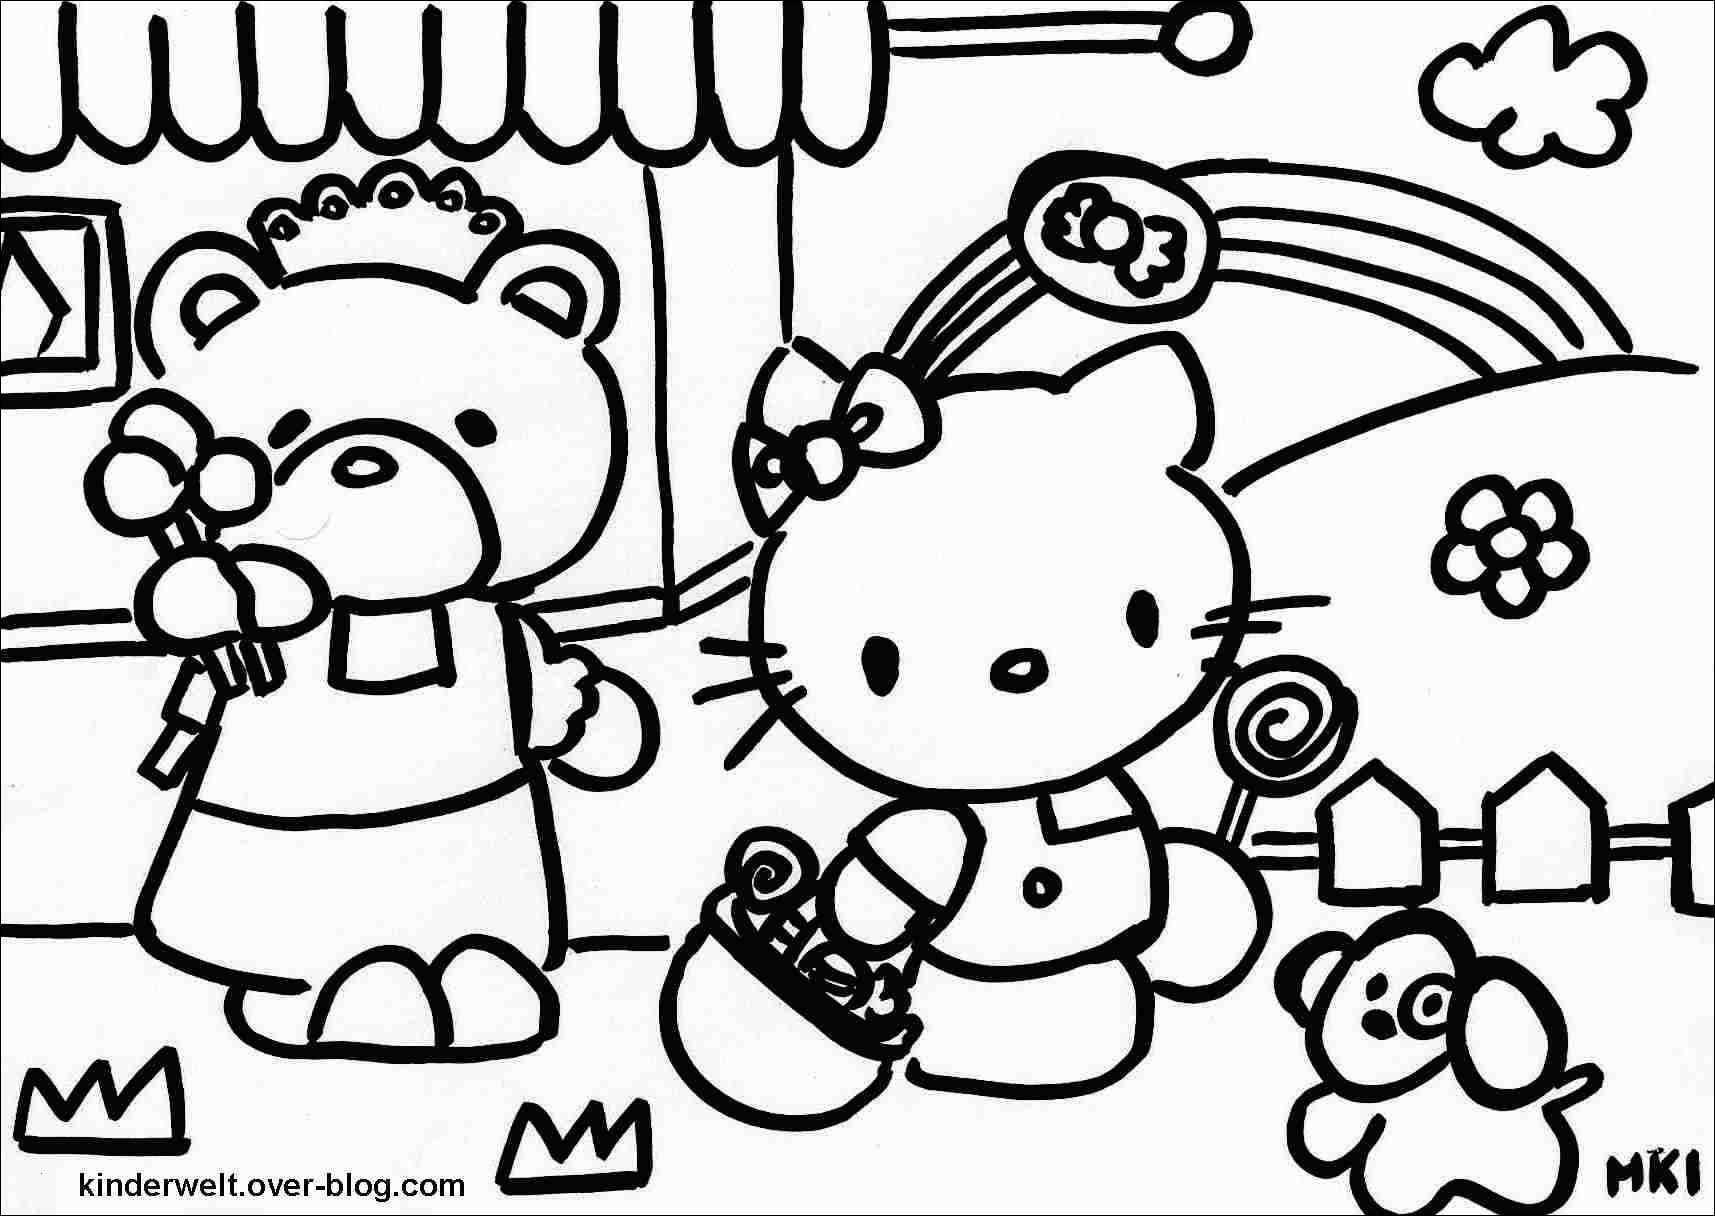 Ausmalbild Hello Kitty Genial Kostenlose Ausmalbilder Hello Kitty Image Malvorlagen Igel Elegant Fotografieren